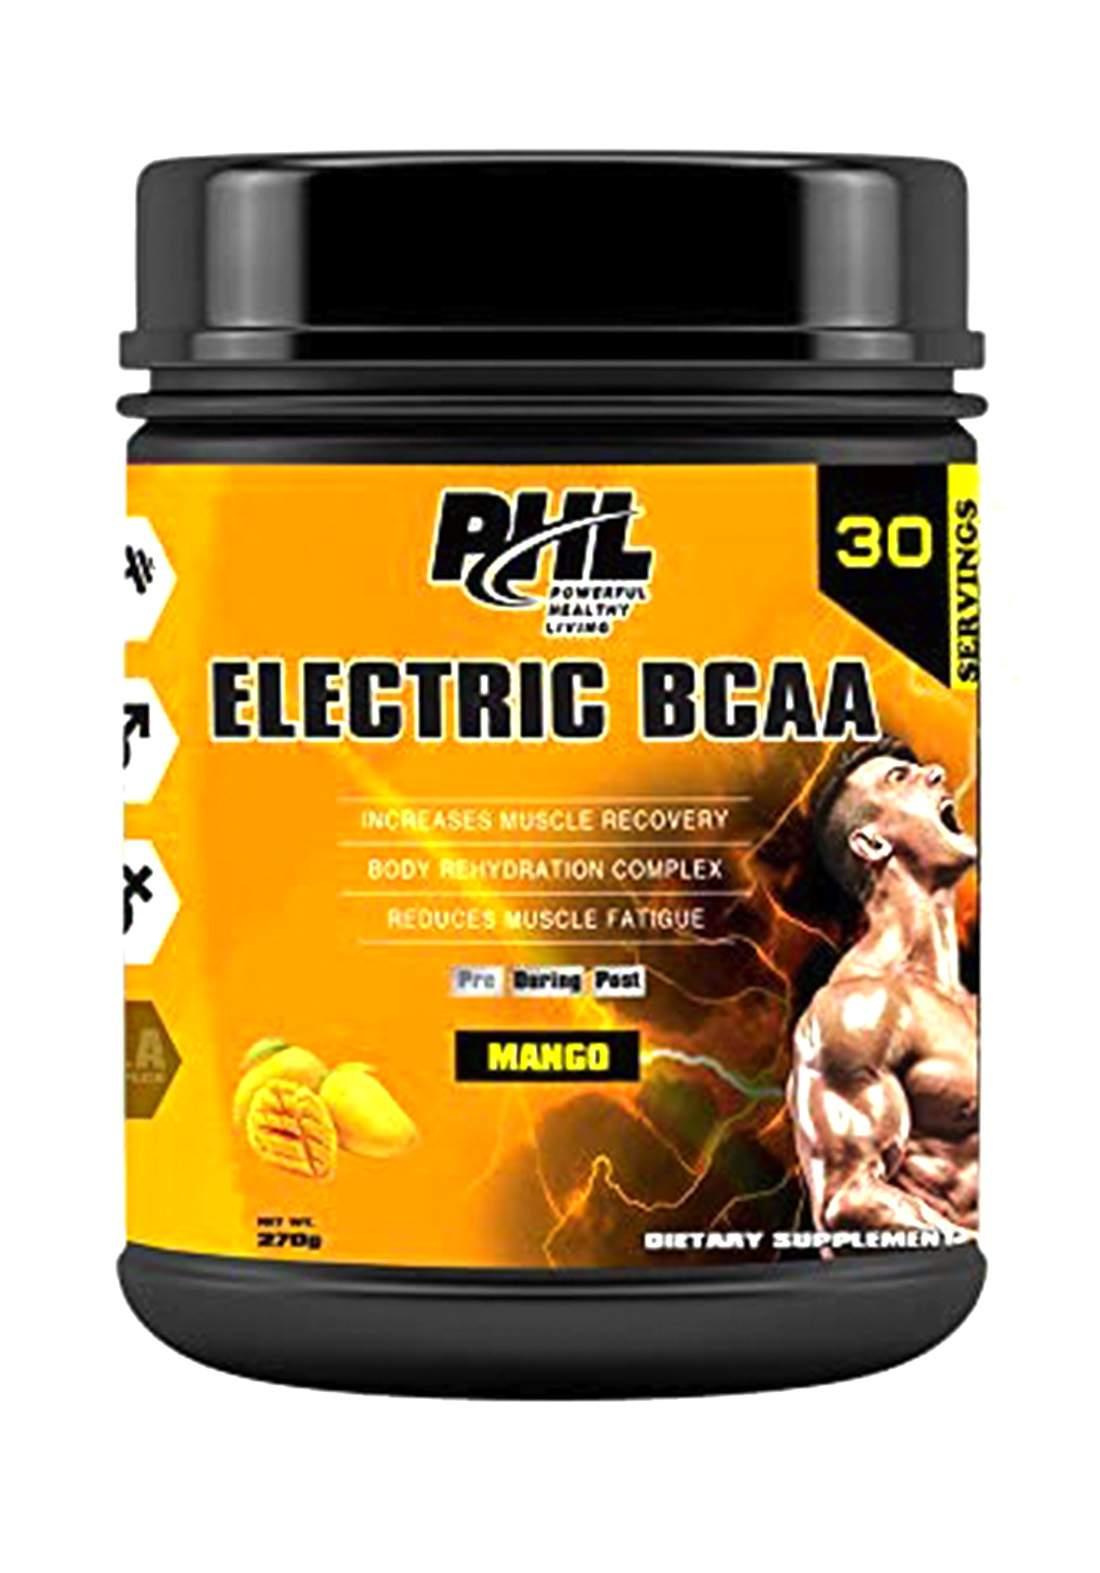 Phl Electric Bcaa Pro-Series Pwd Mango 30 servings 270gm مكمل غذائي